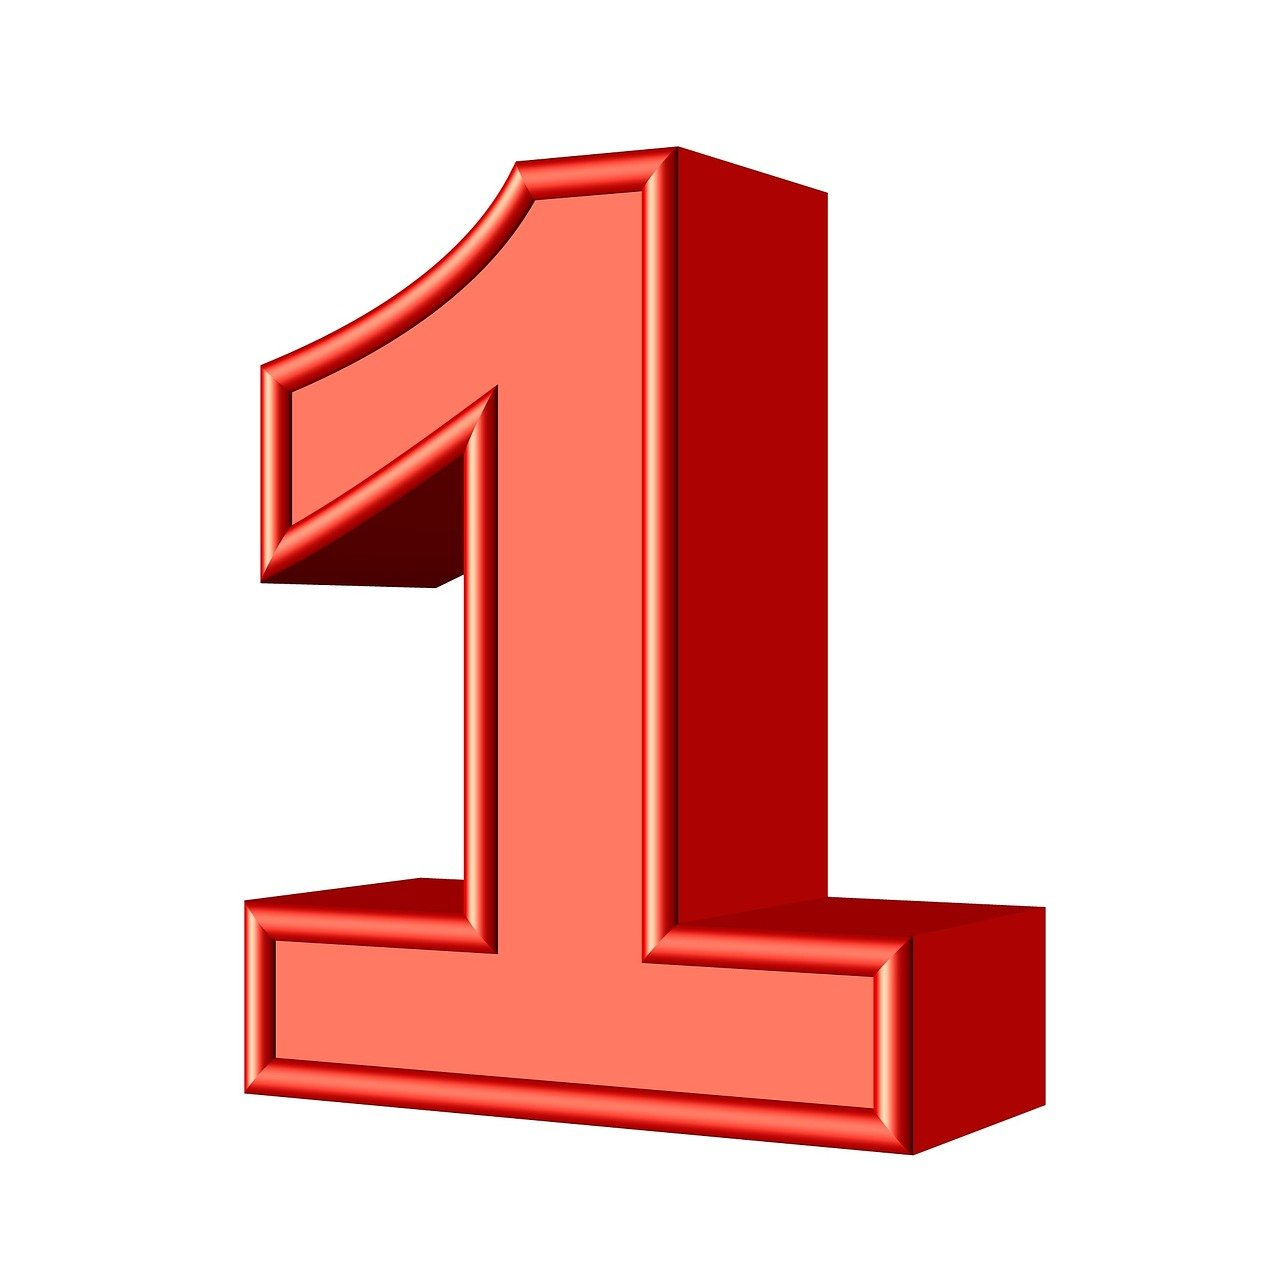 One 1 Number - Free image on Pixabay